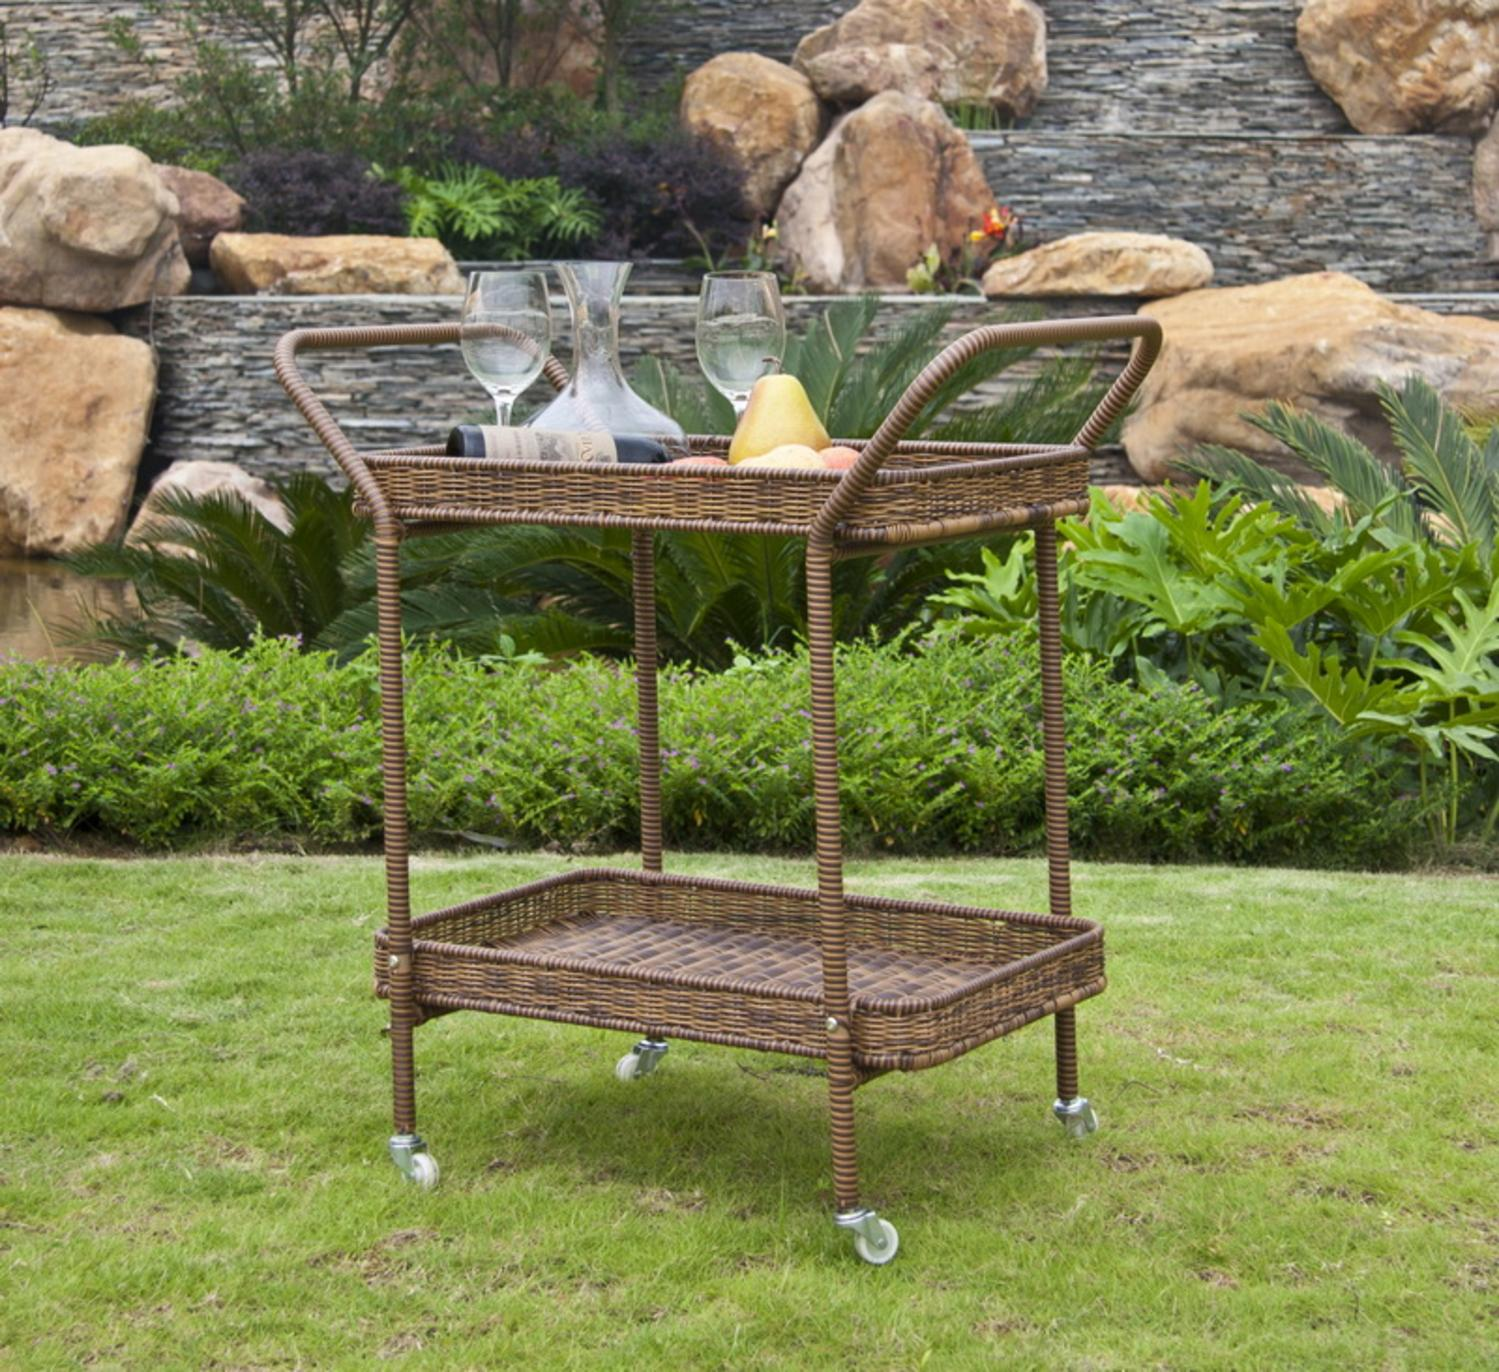 "32"" Honey Brown Resin Wicker Outdoor Patio Garden Serving Cart with Wheels by CC Outdoor Living"